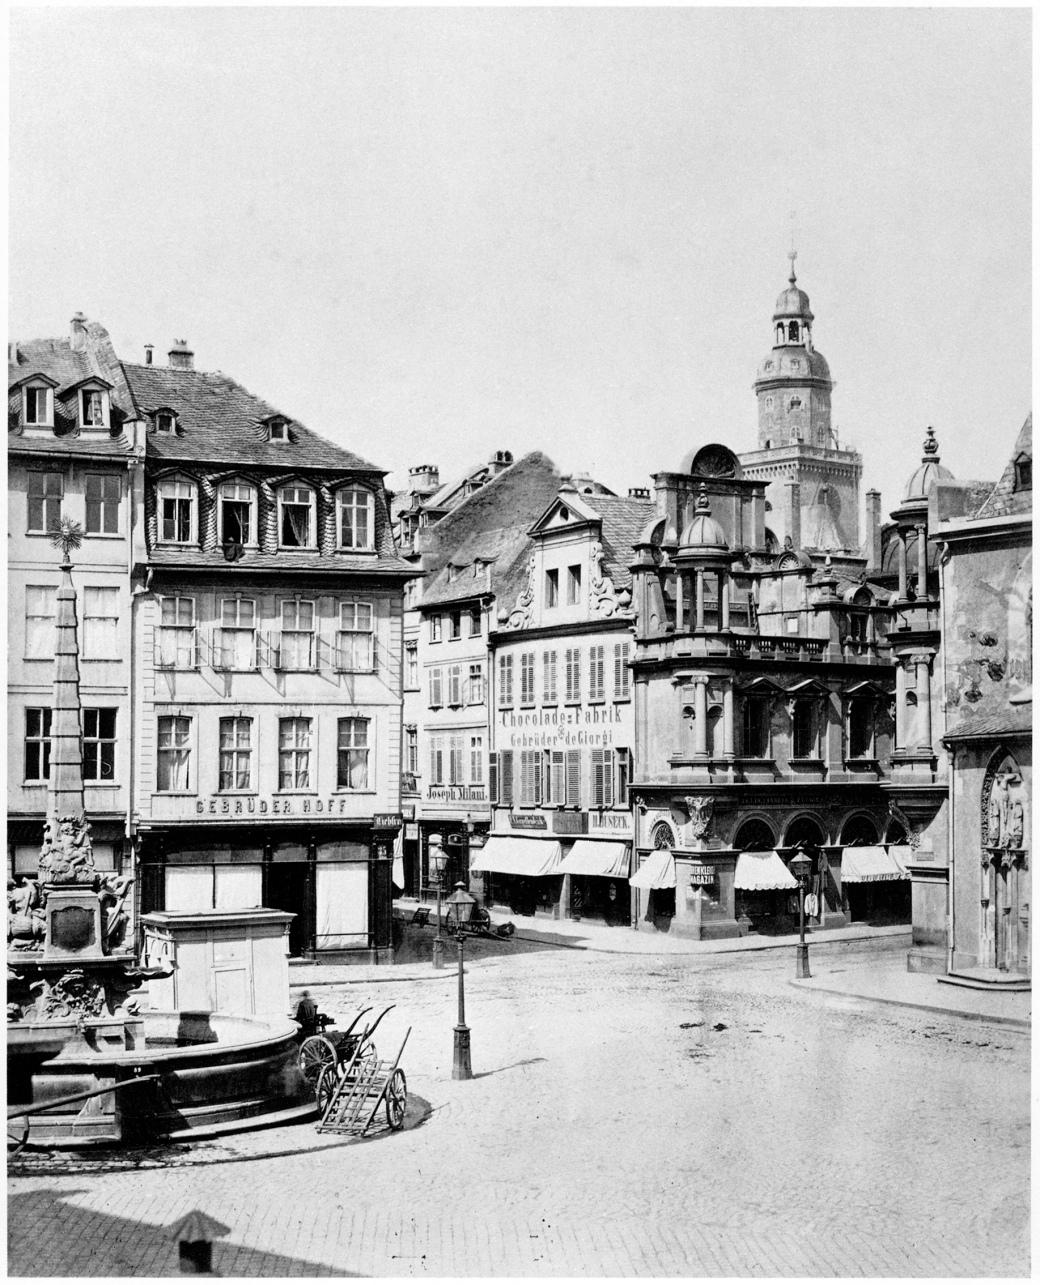 Frankfurt_Am_Main-Liebfrauenberg_mit_Malakoff-Carl_Friedrich_Mylius-1873